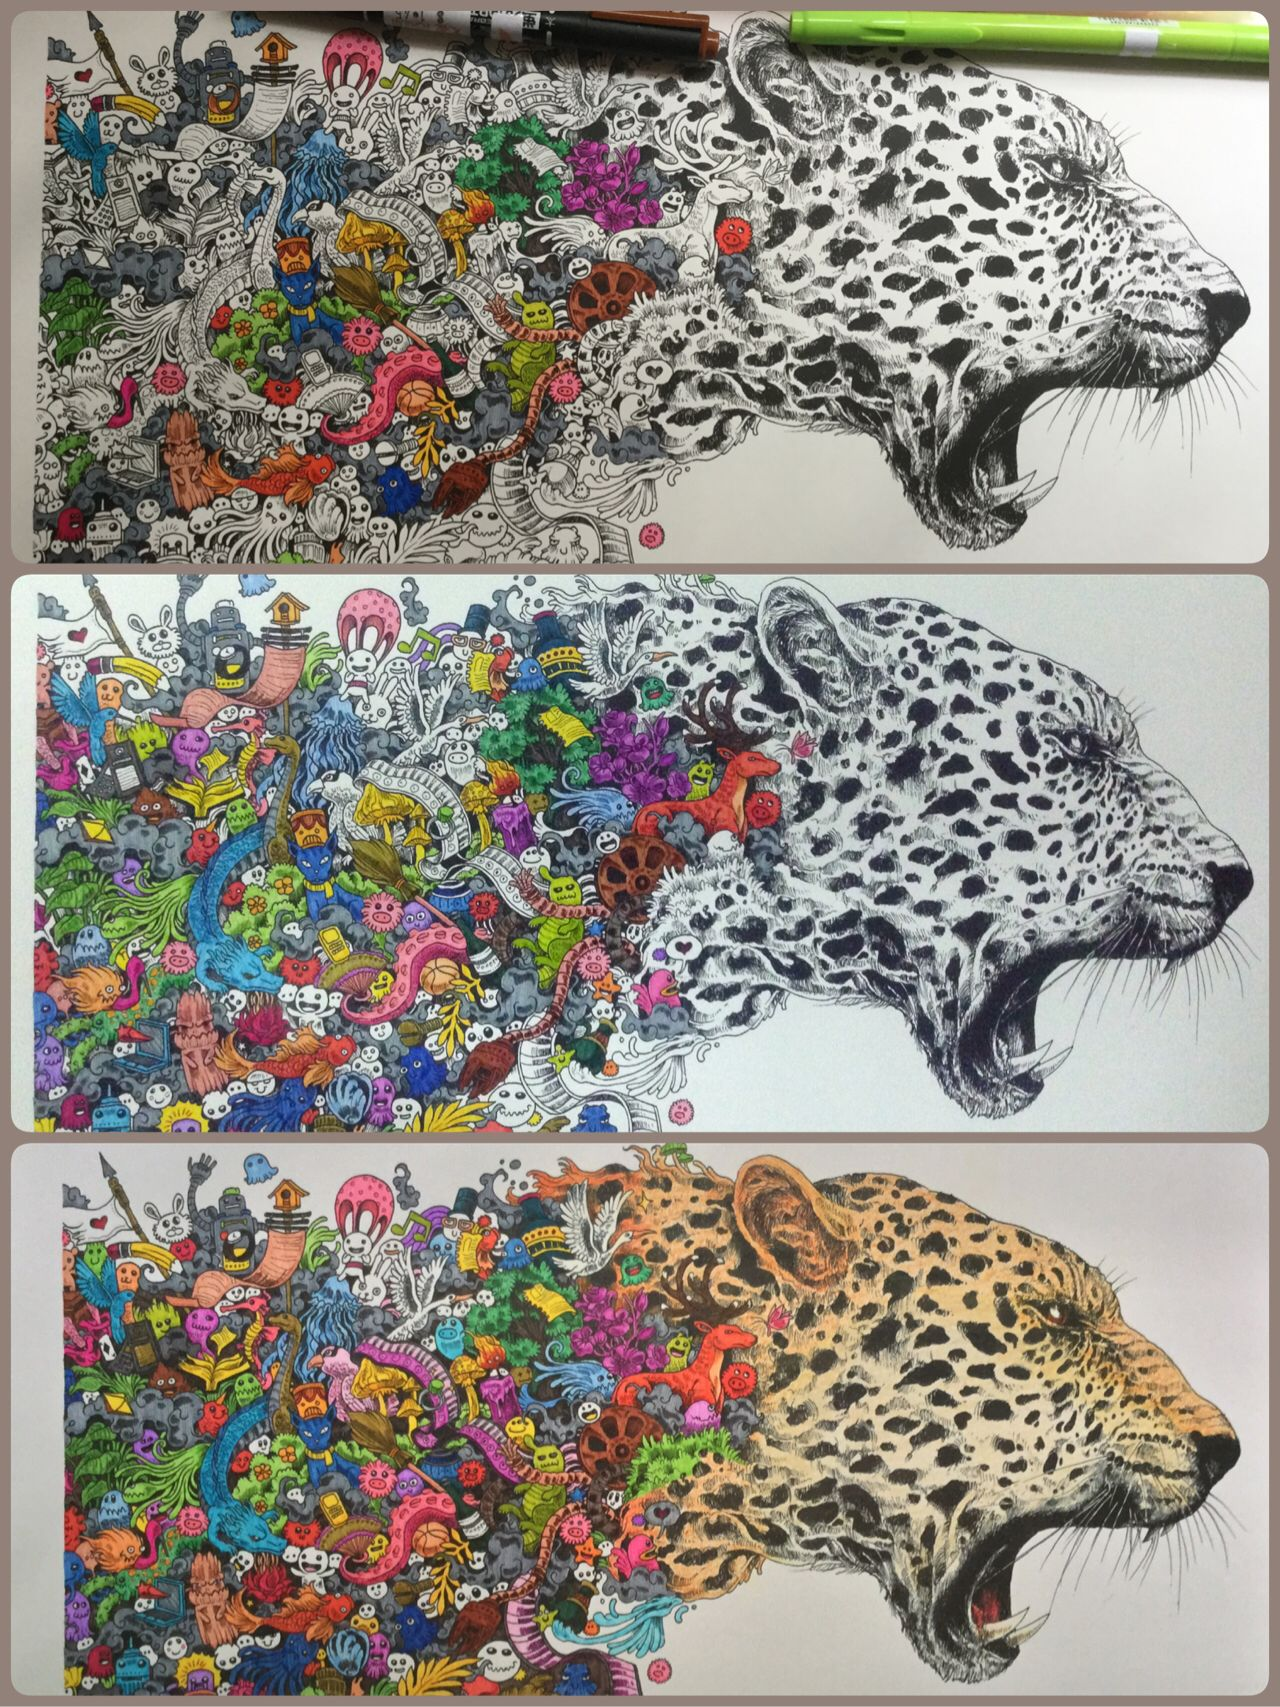 Cheetah From Animorphia Coloring Book Illustrated By Kerby Rosanes Animorphia Coloring Coloring Book Art Animorphia Coloring Book